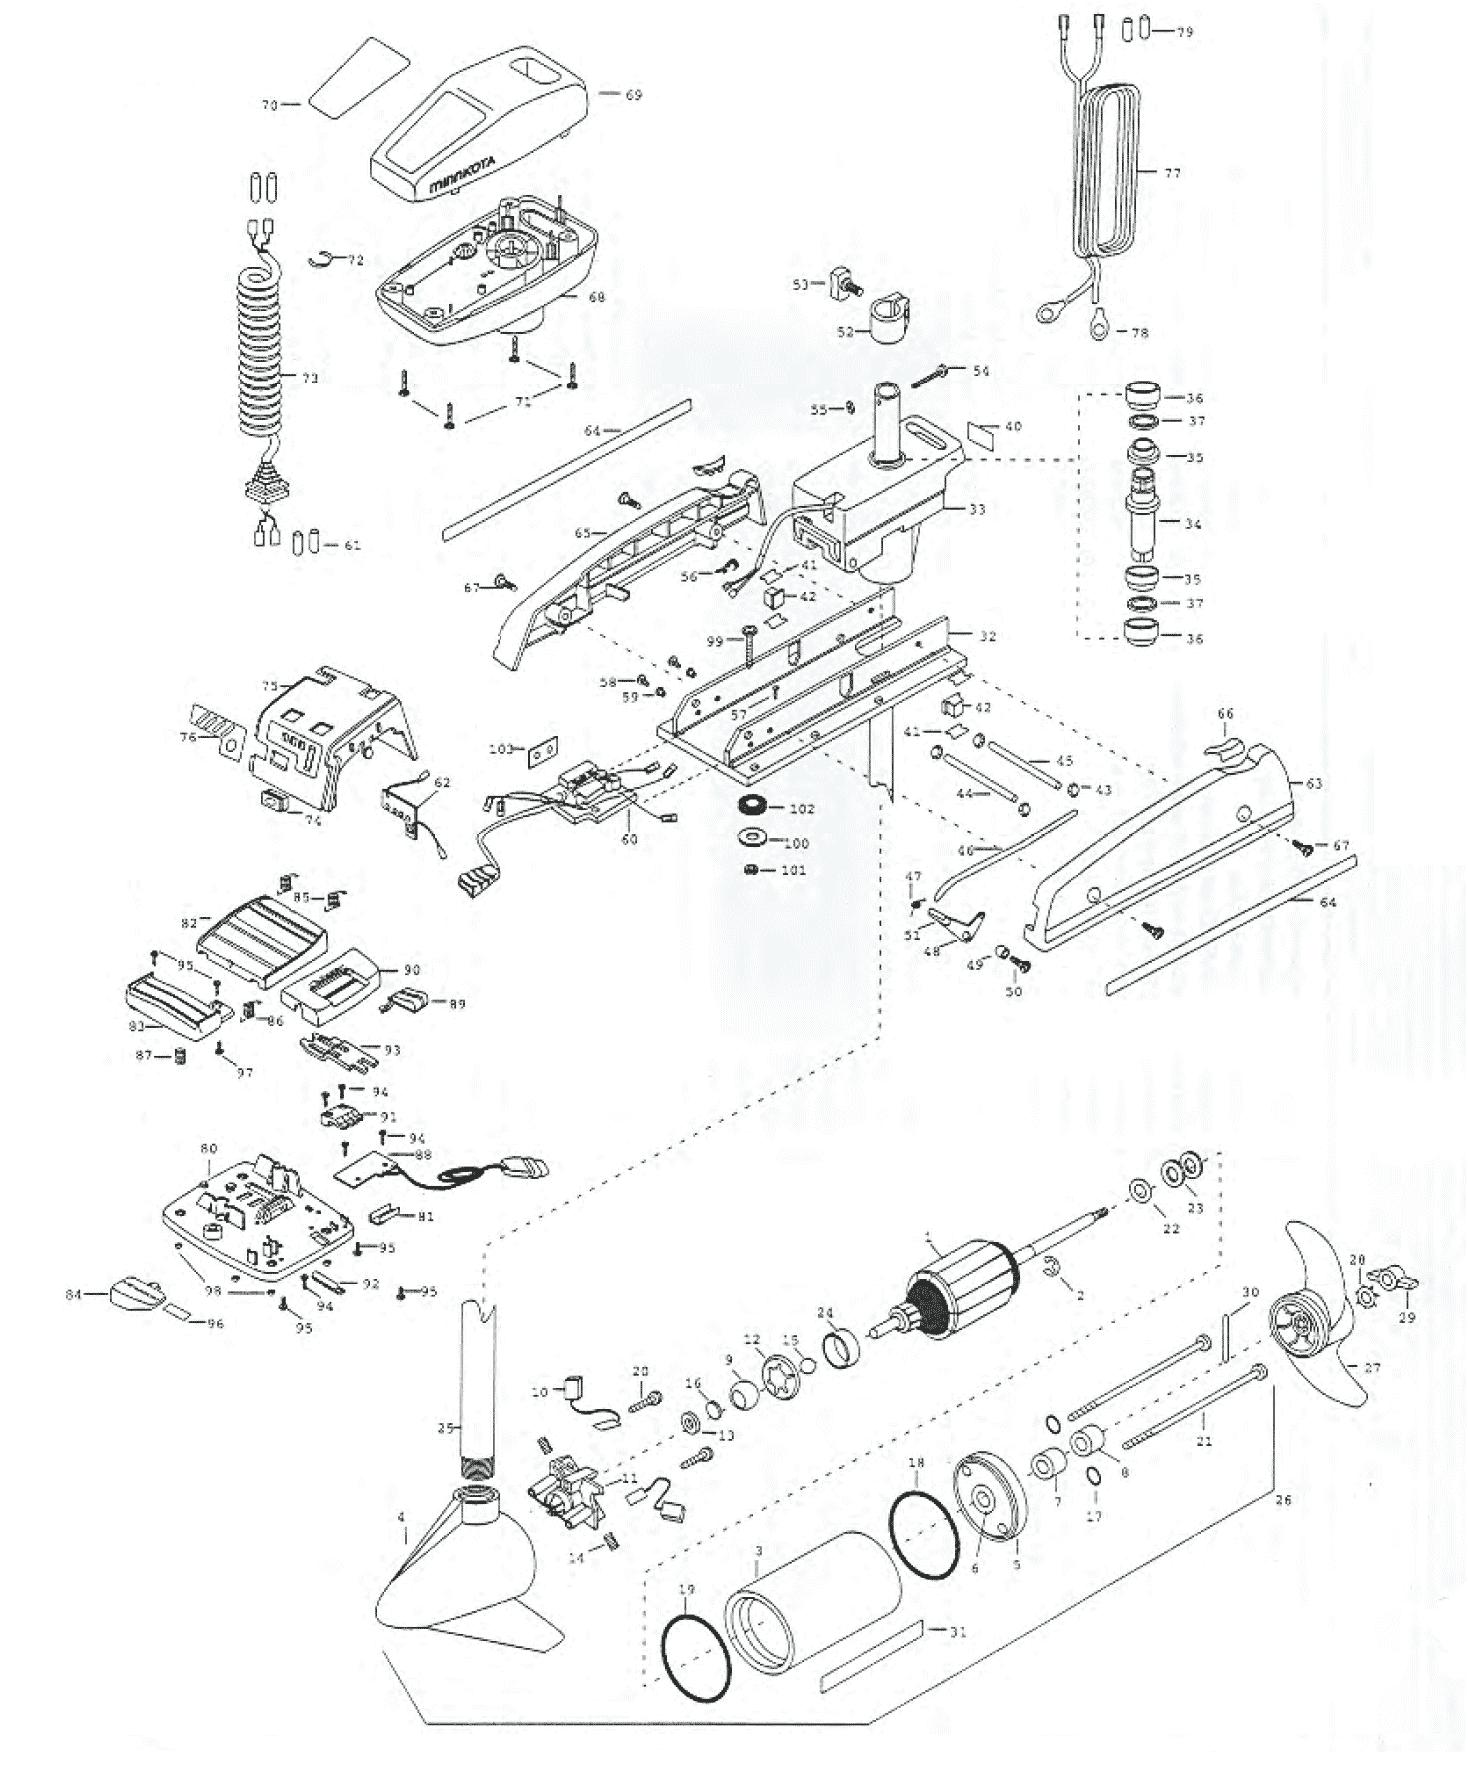 minn kota powerdrive 38 pro parts